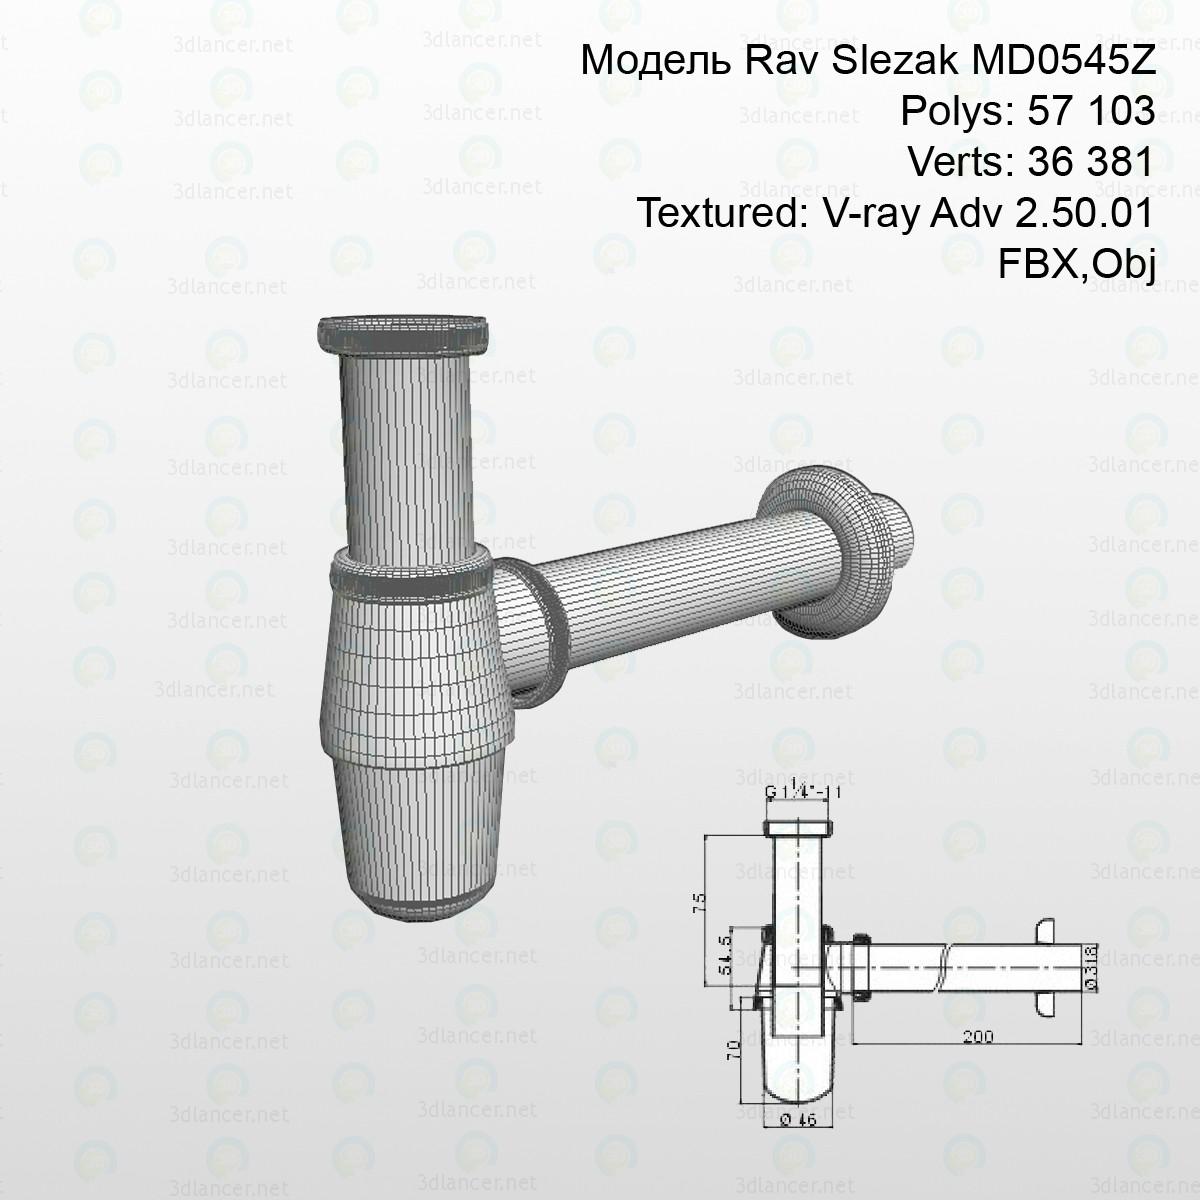 Sifón Rav Slezak MD0545Z 3D modelo Compro - render